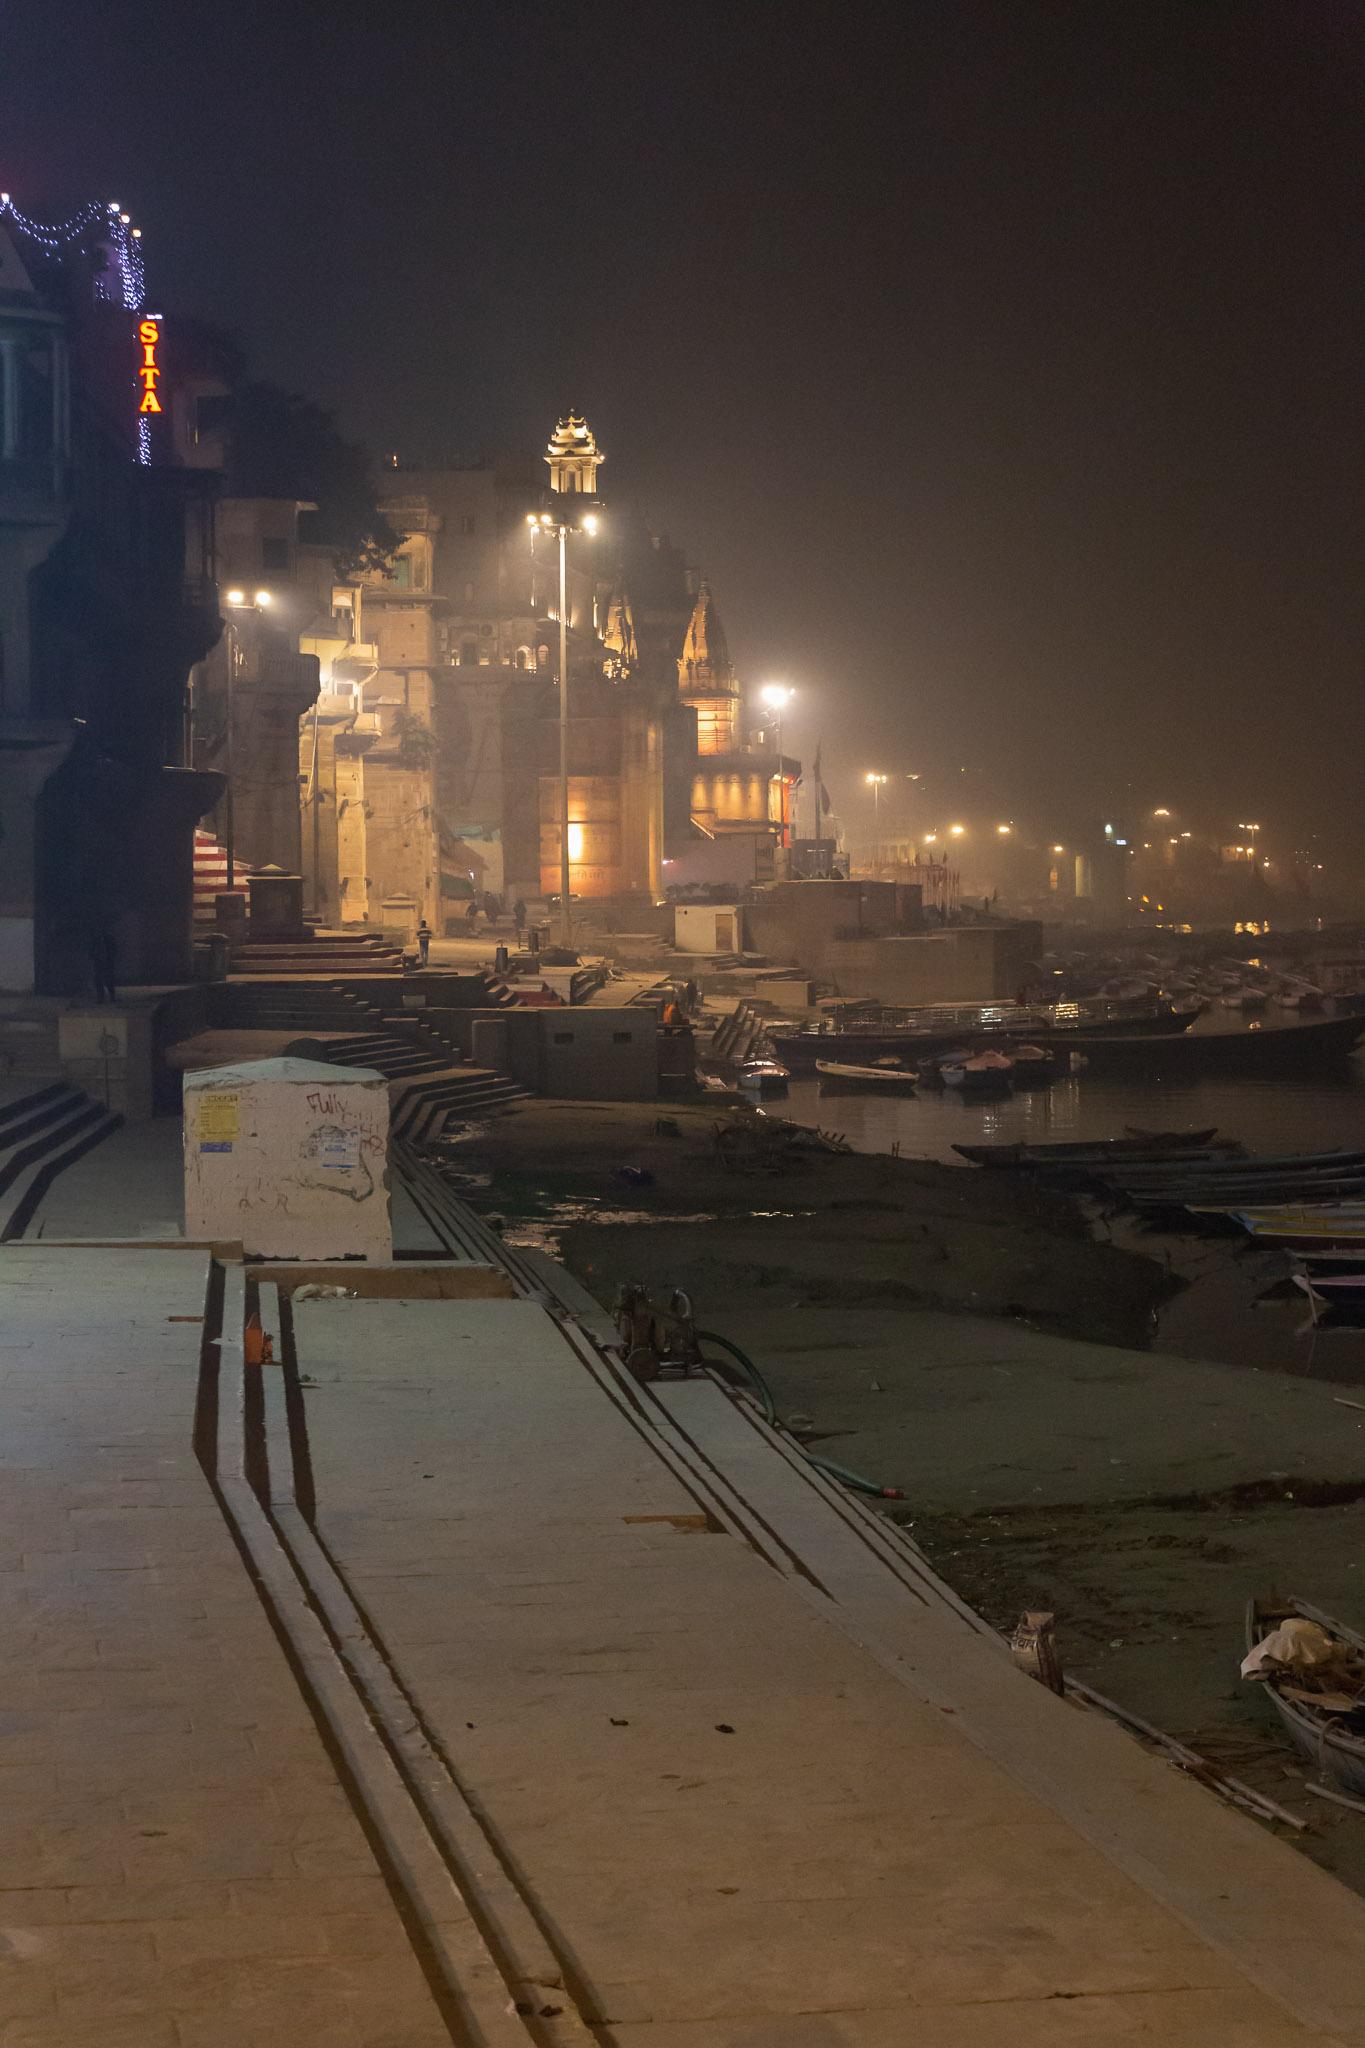 Night photo of Varanasi's misty river front.